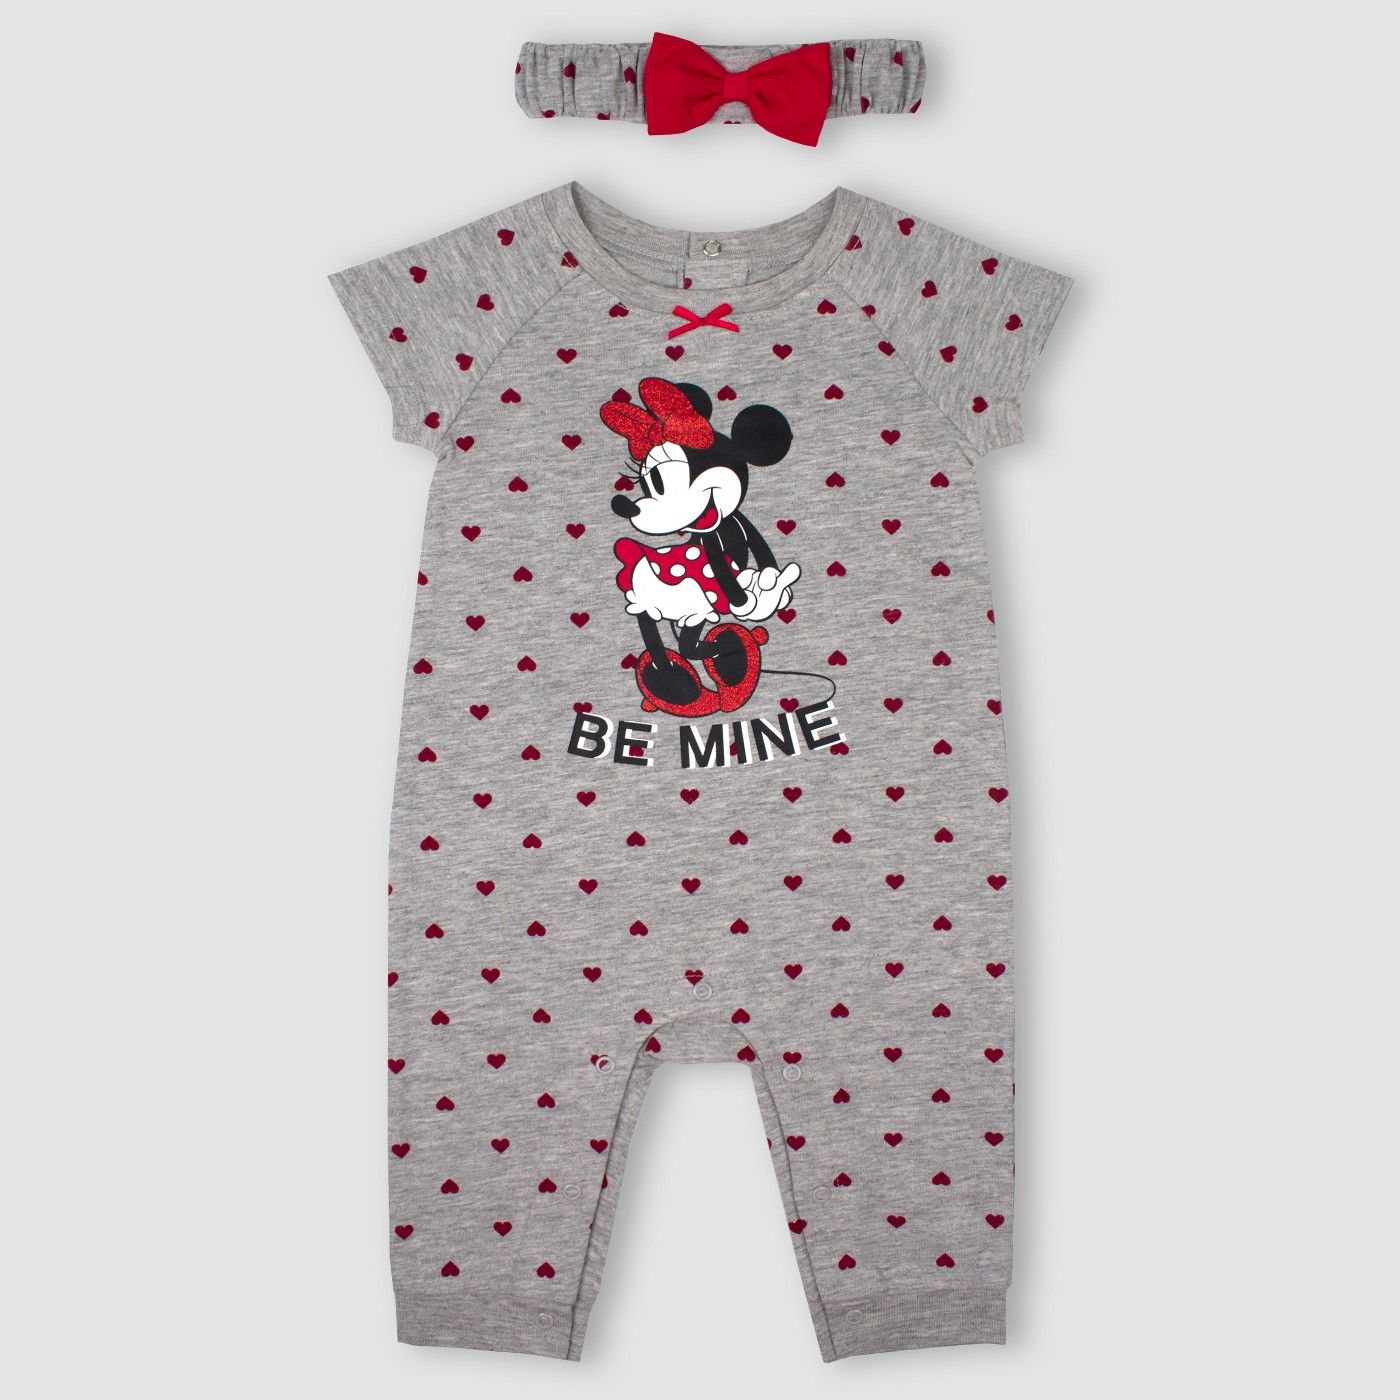 Character Wear Minnie Mouse Playsuit Girls Grey Short Jumpsuit